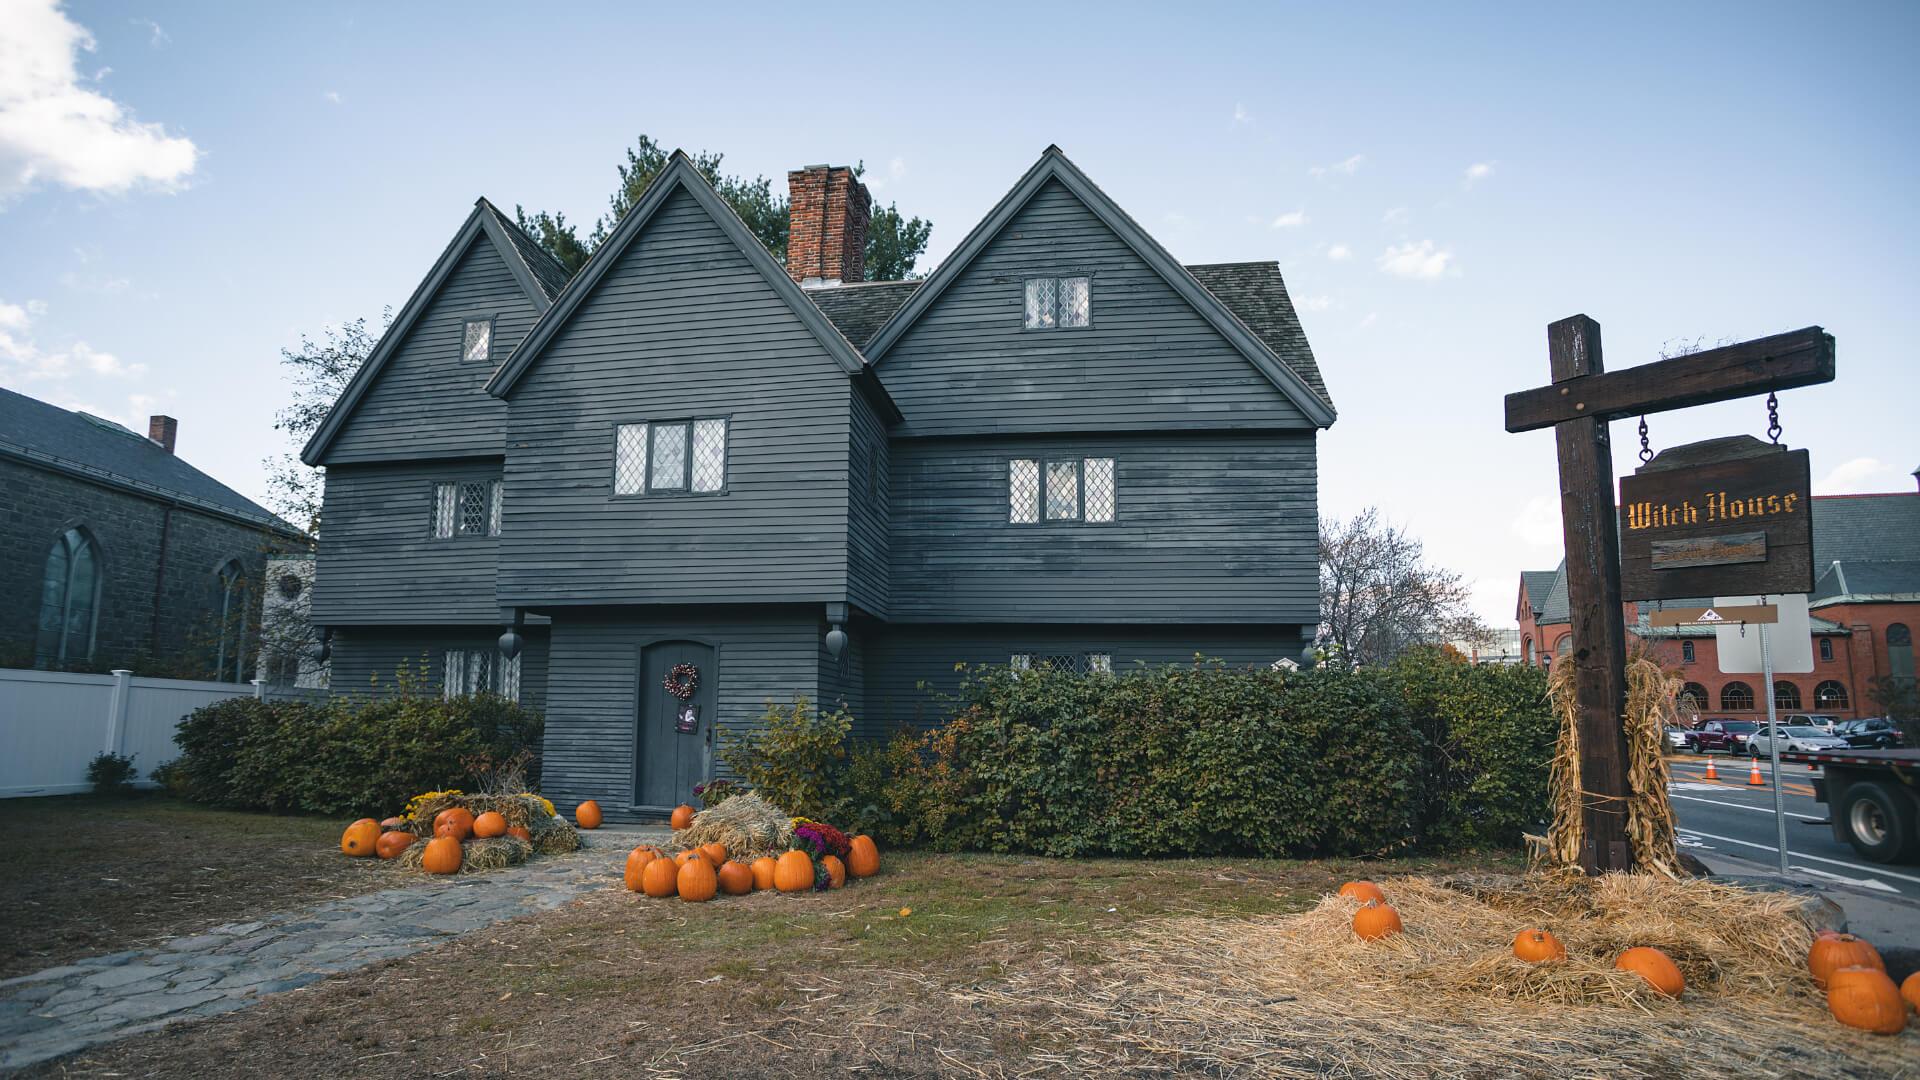 The Little Women ve Salem Witch